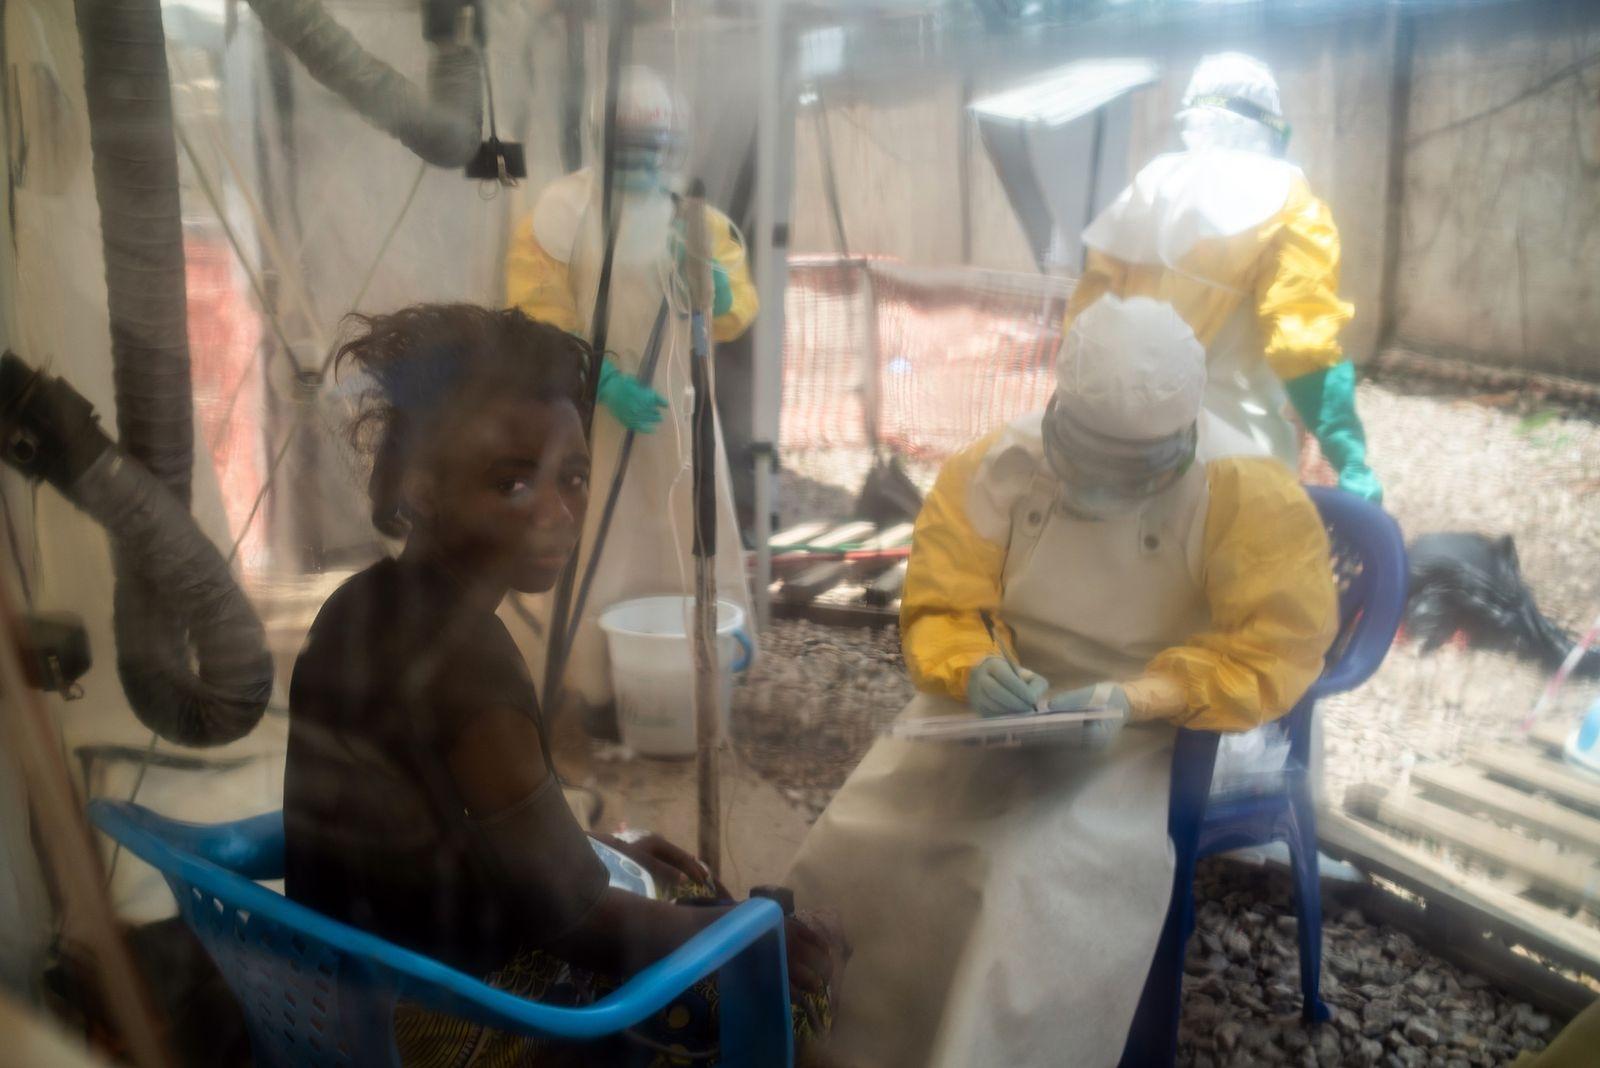 Ebolapatient